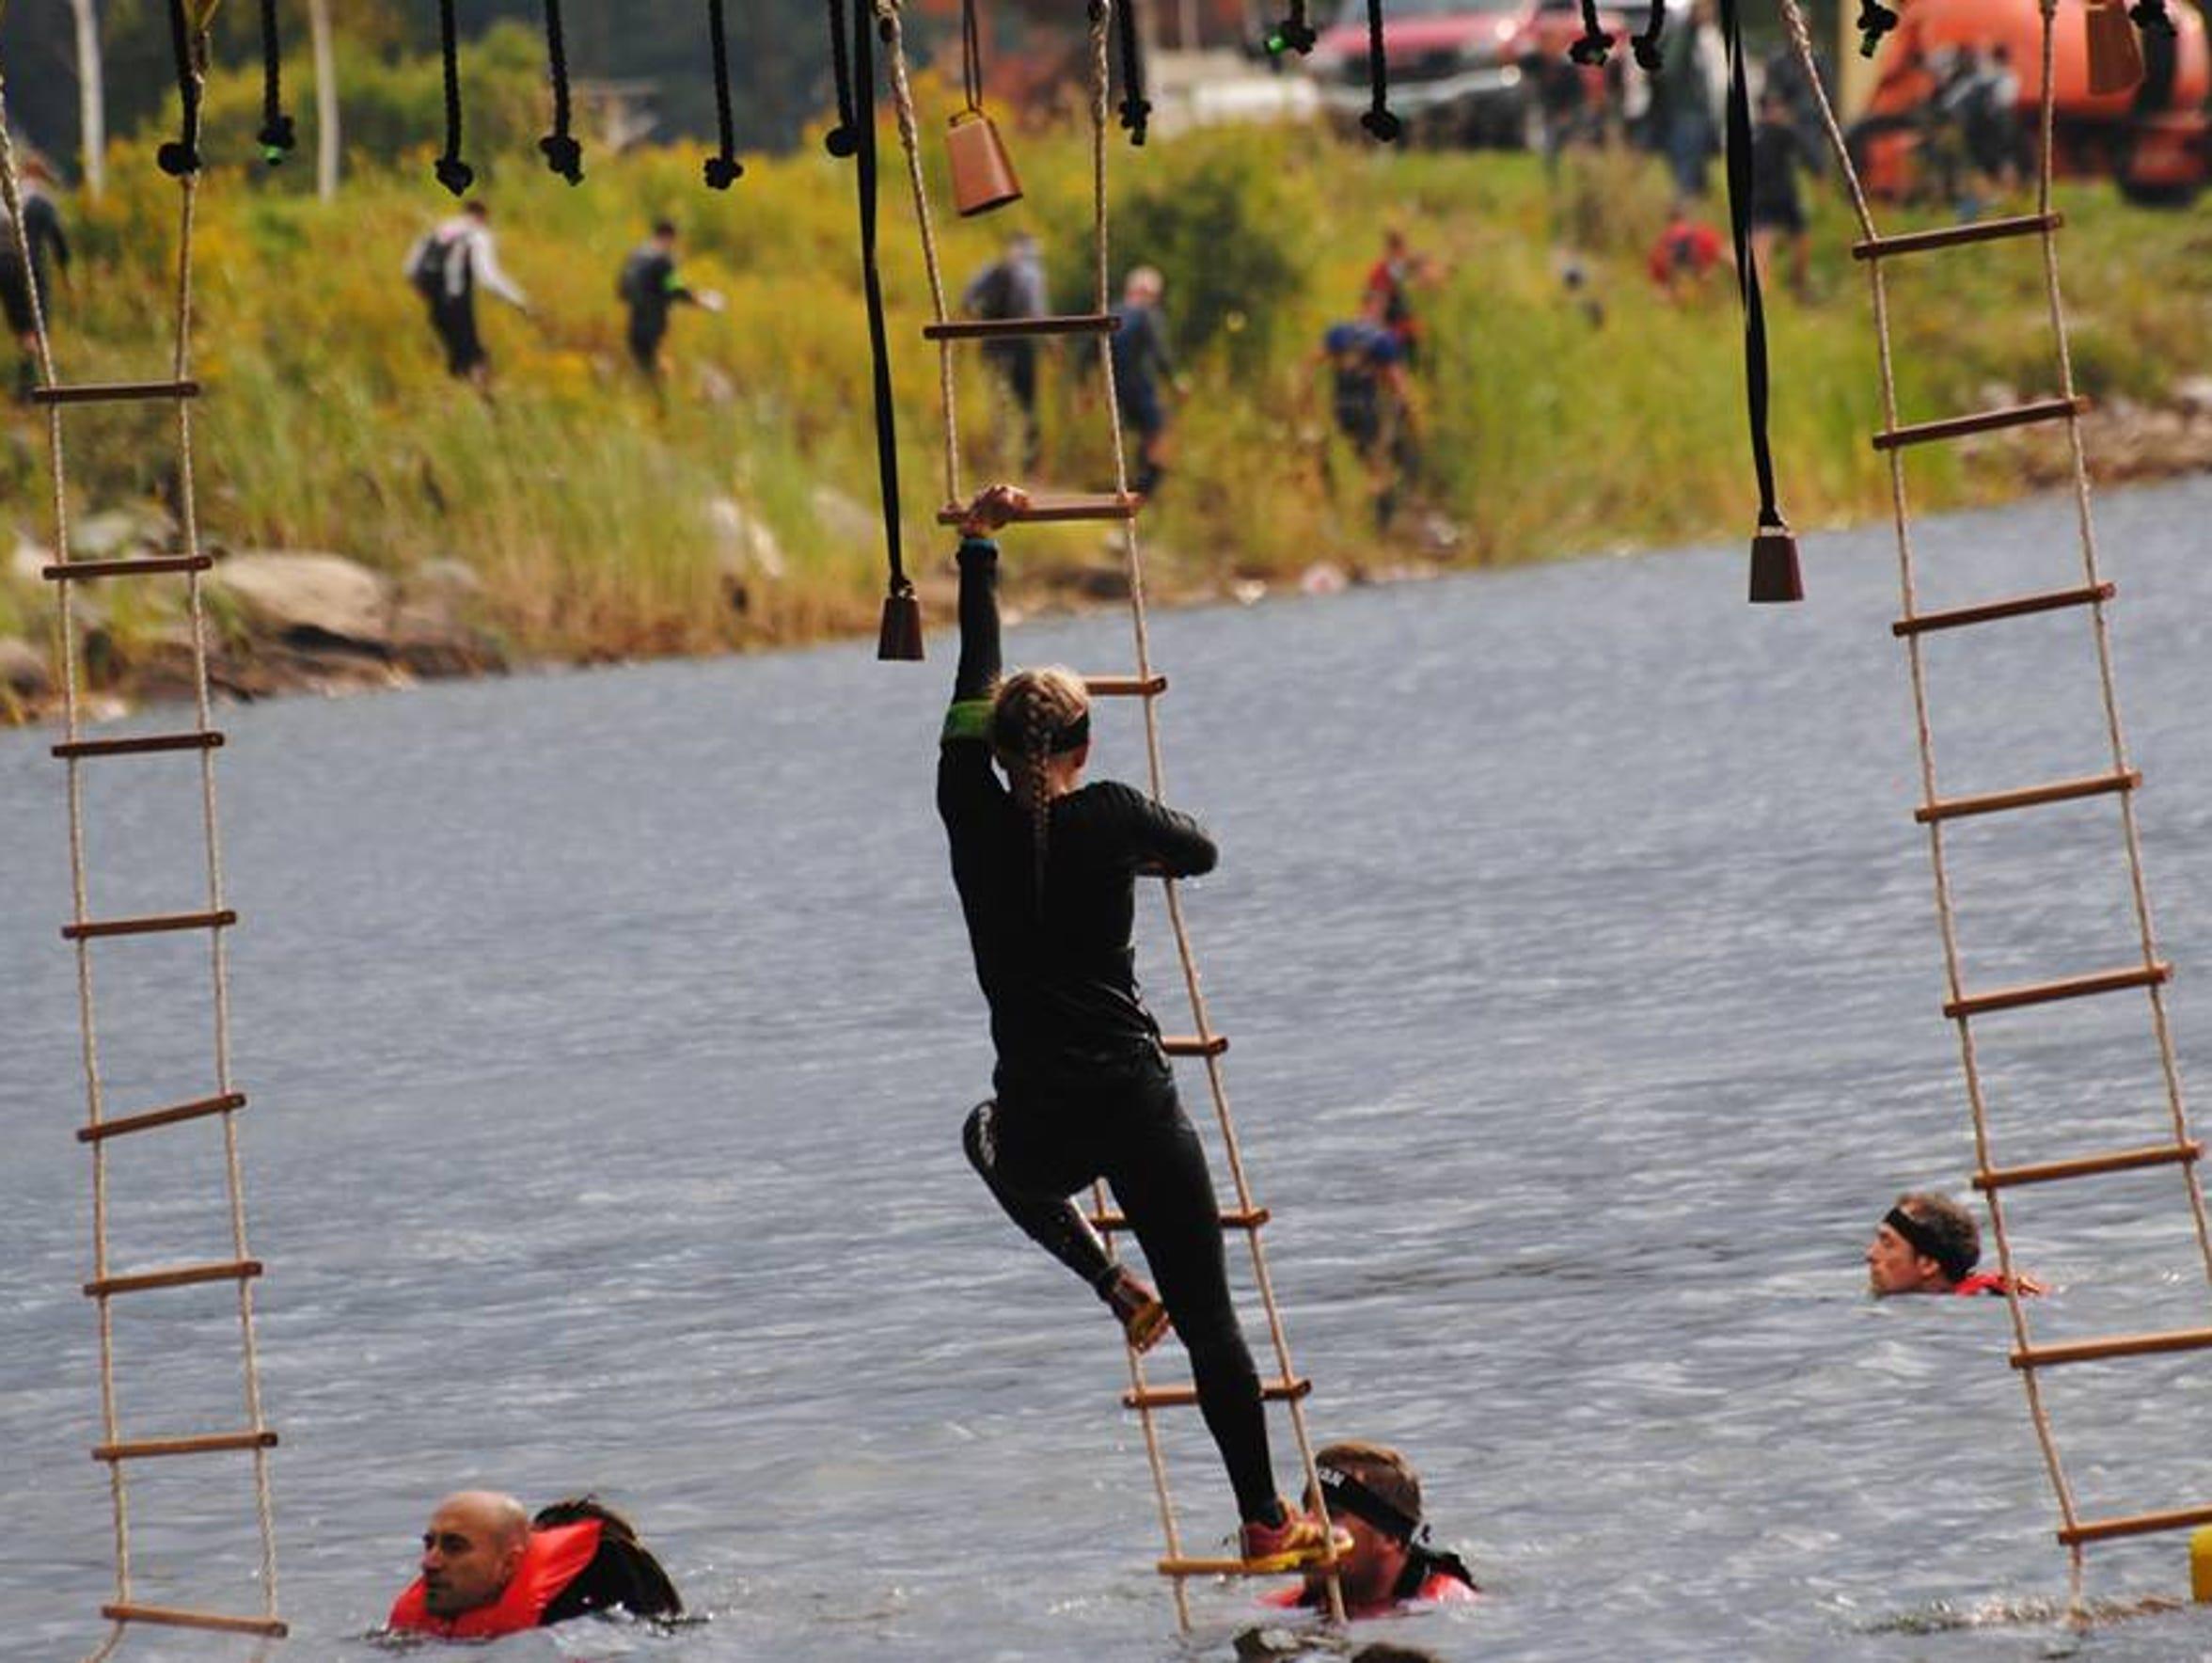 Winter Vinecki seen here climbing up a rope ladder